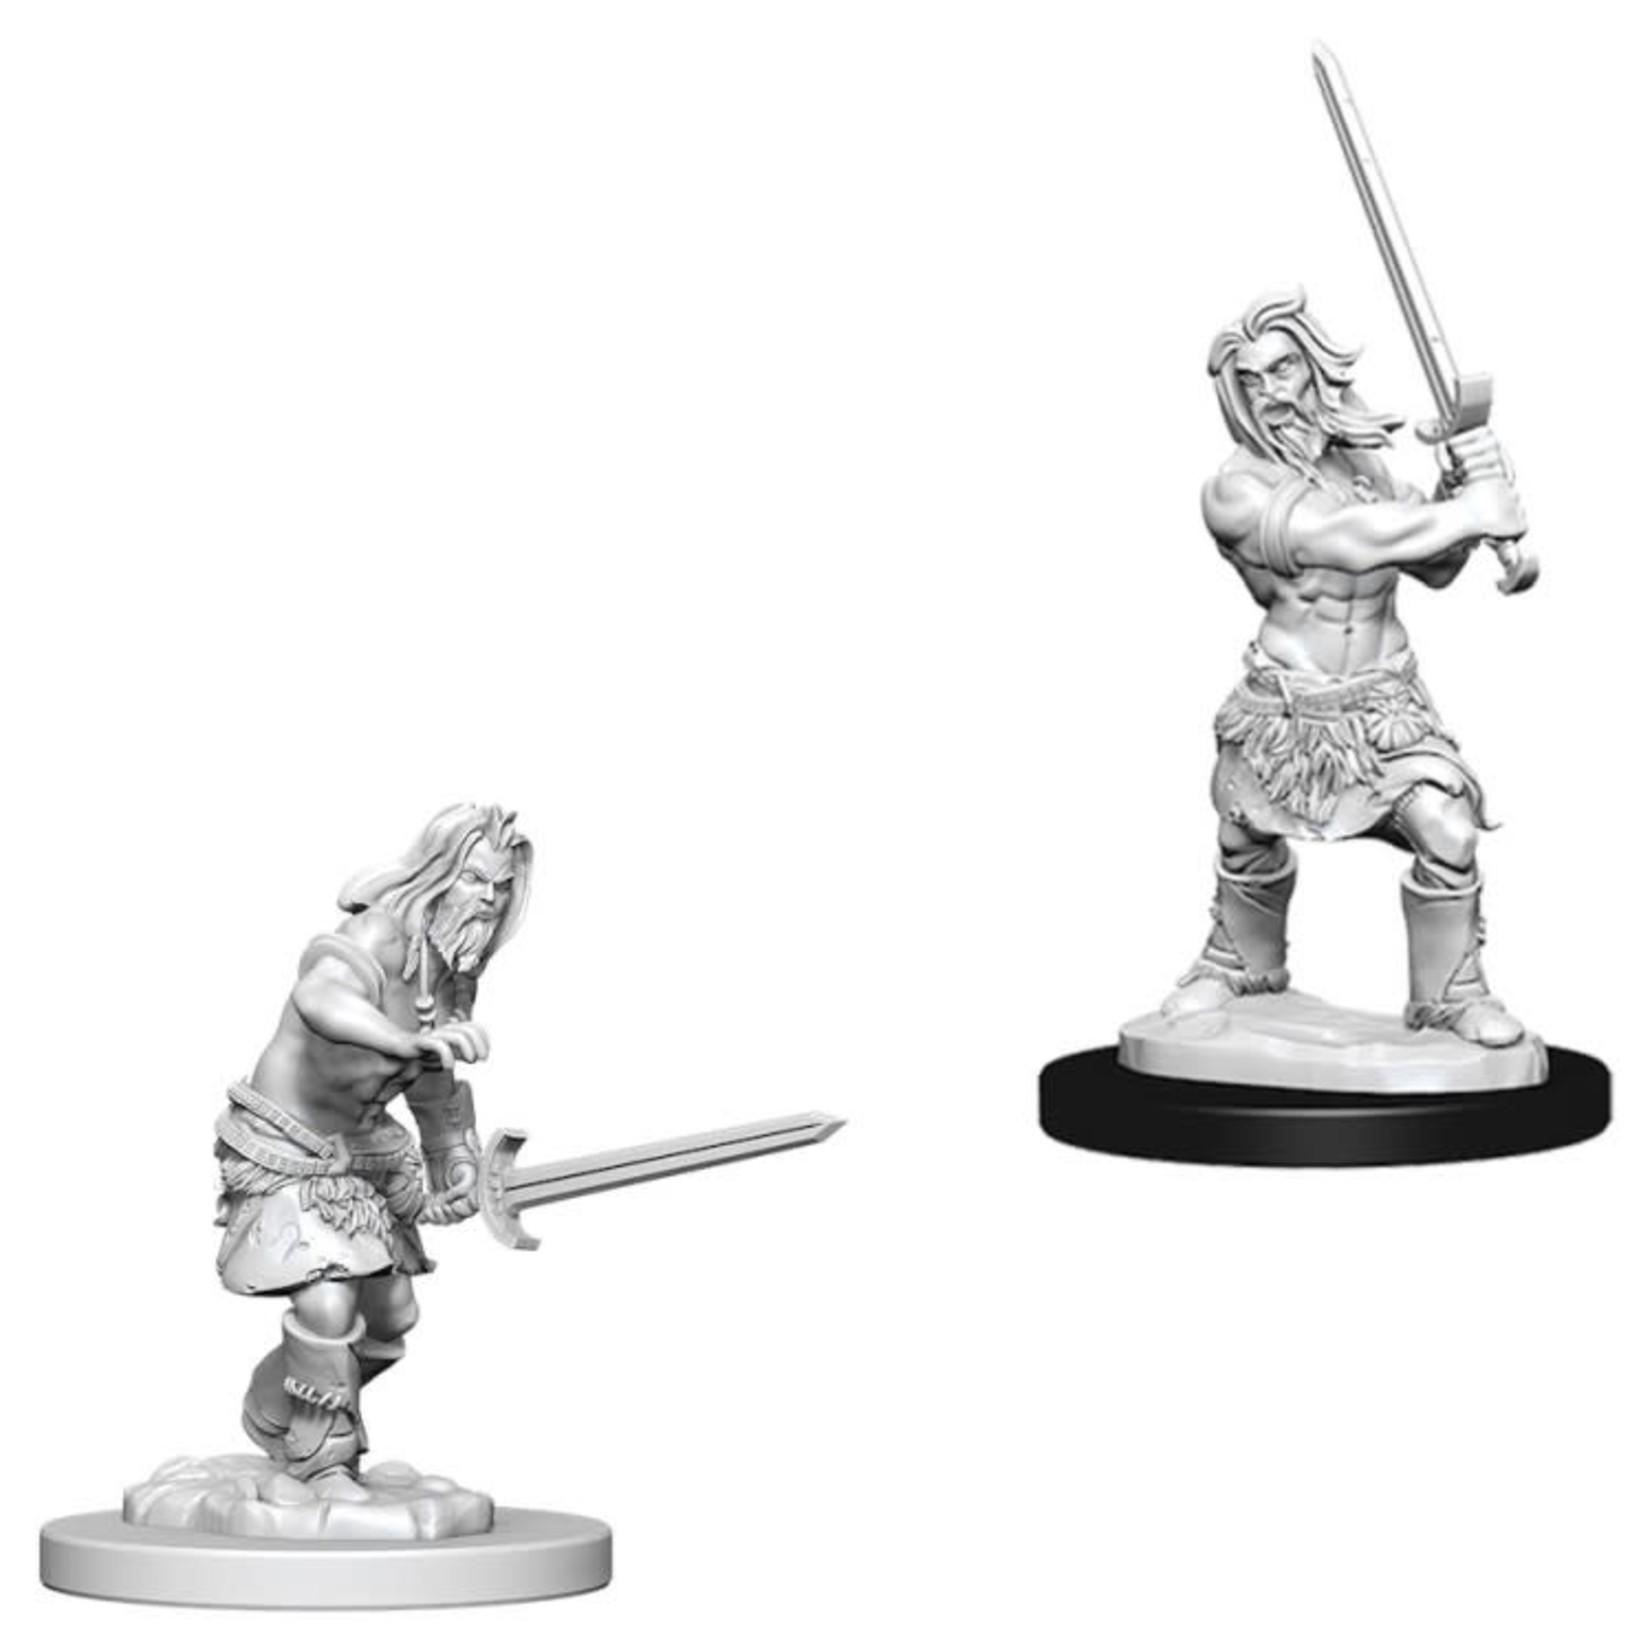 WizKids Pathfinder Minis (unpainted): Human Barbarian (male) Wave 6, 73413